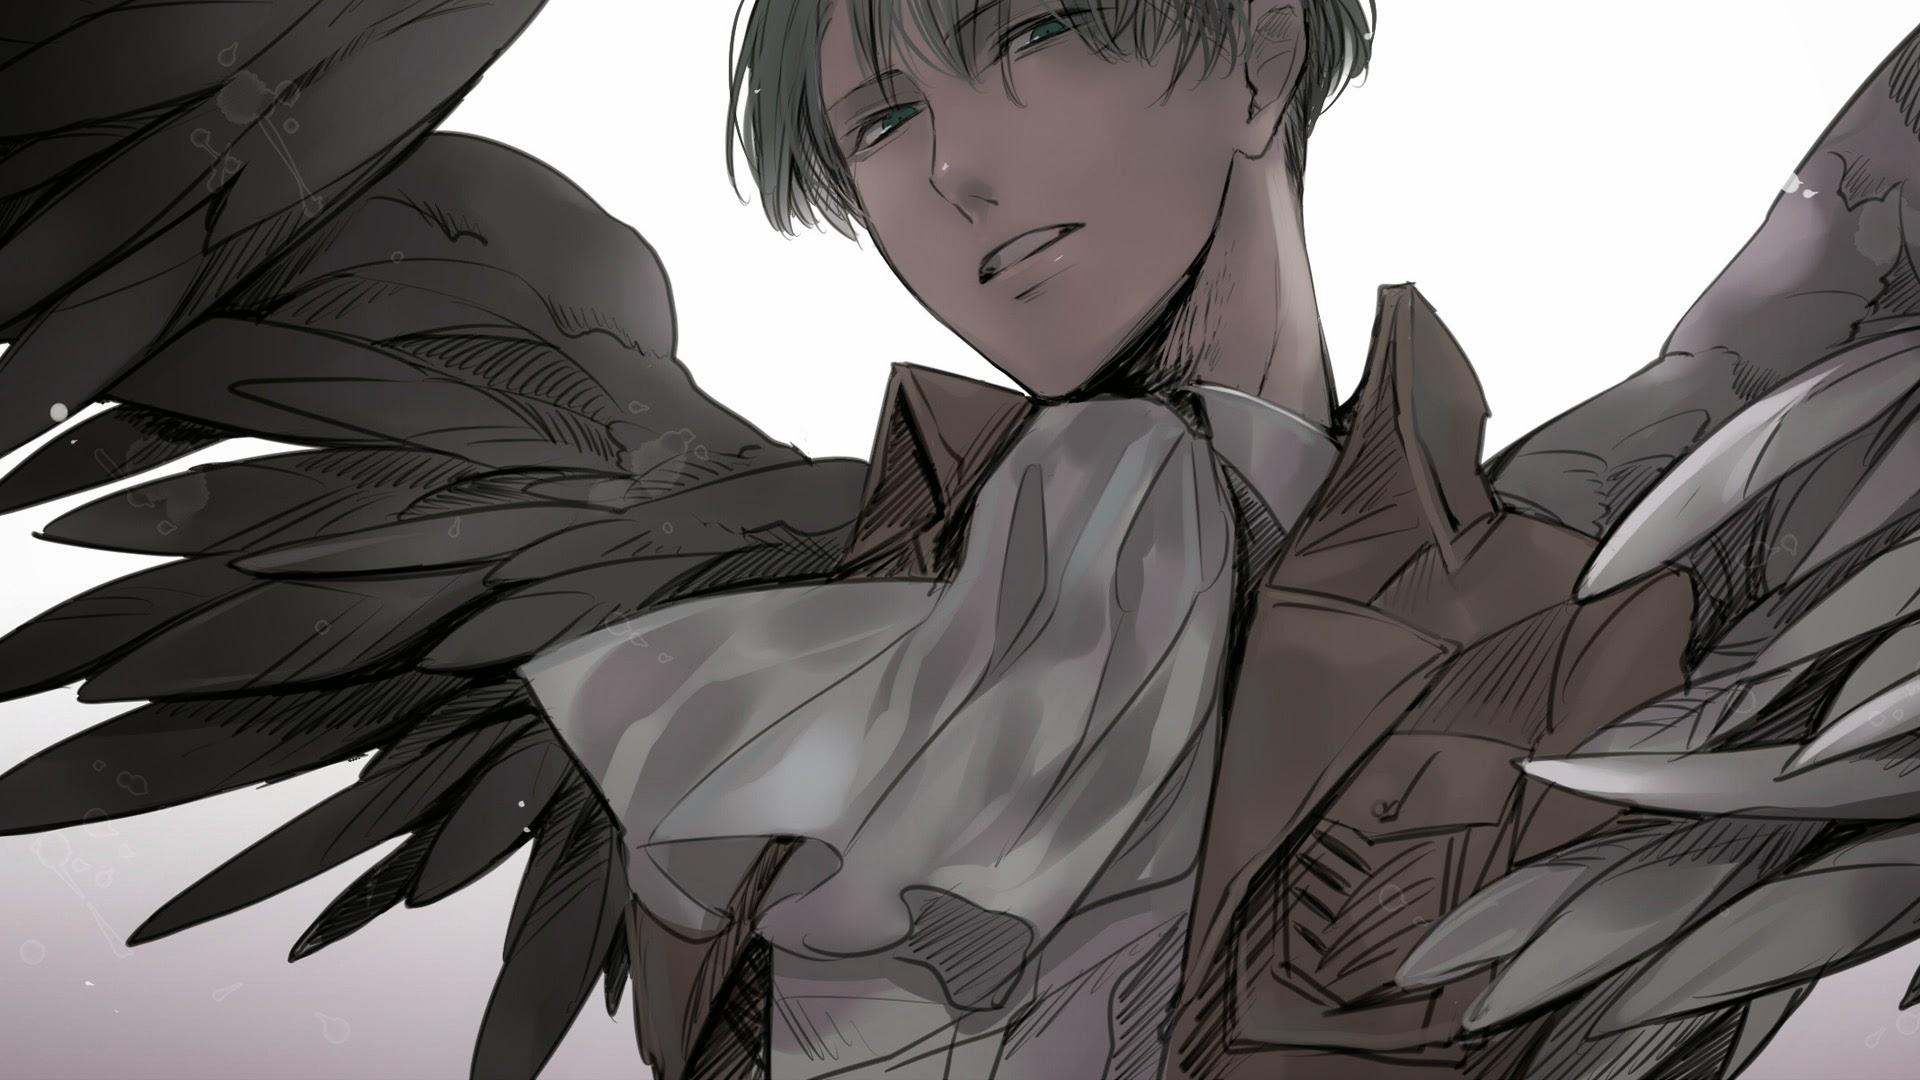 levi rivaille ttack on titan shingeki no kyojin anime hd wallpaper ...